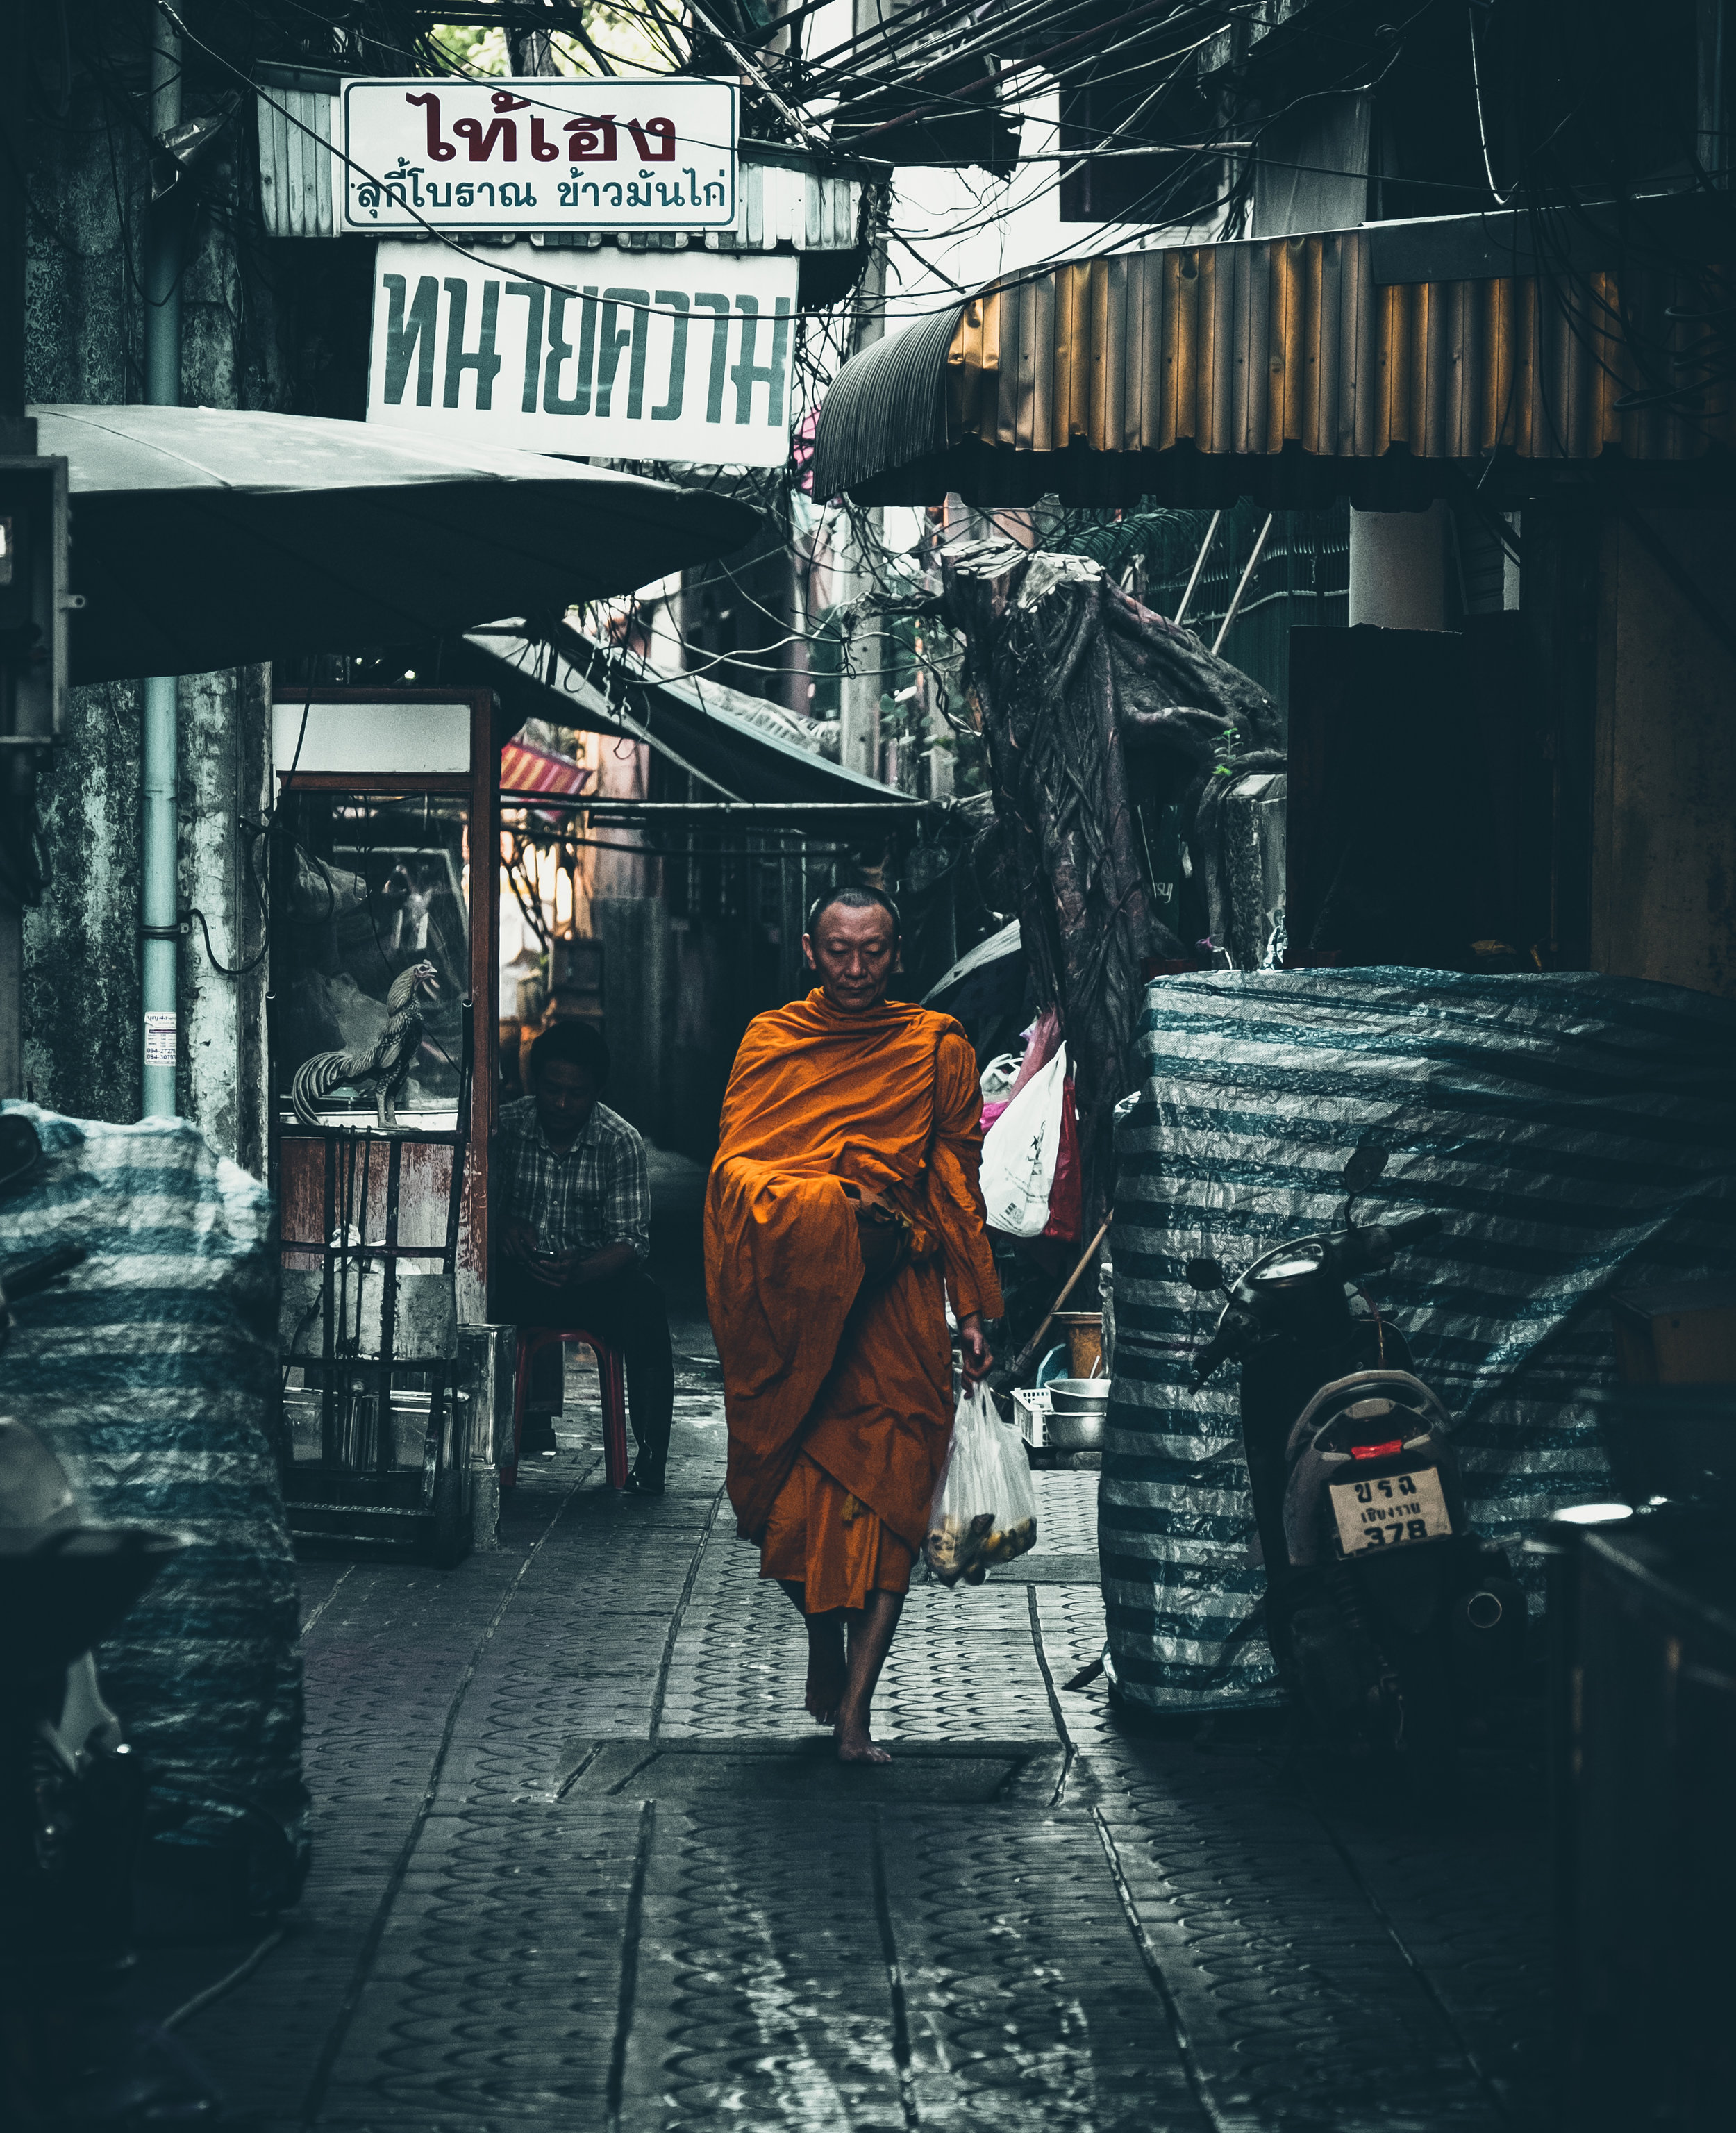 chinatown-yaowarat-bangkok-thailand-street-photography-raw-urban-studios-fujifilm.jpg